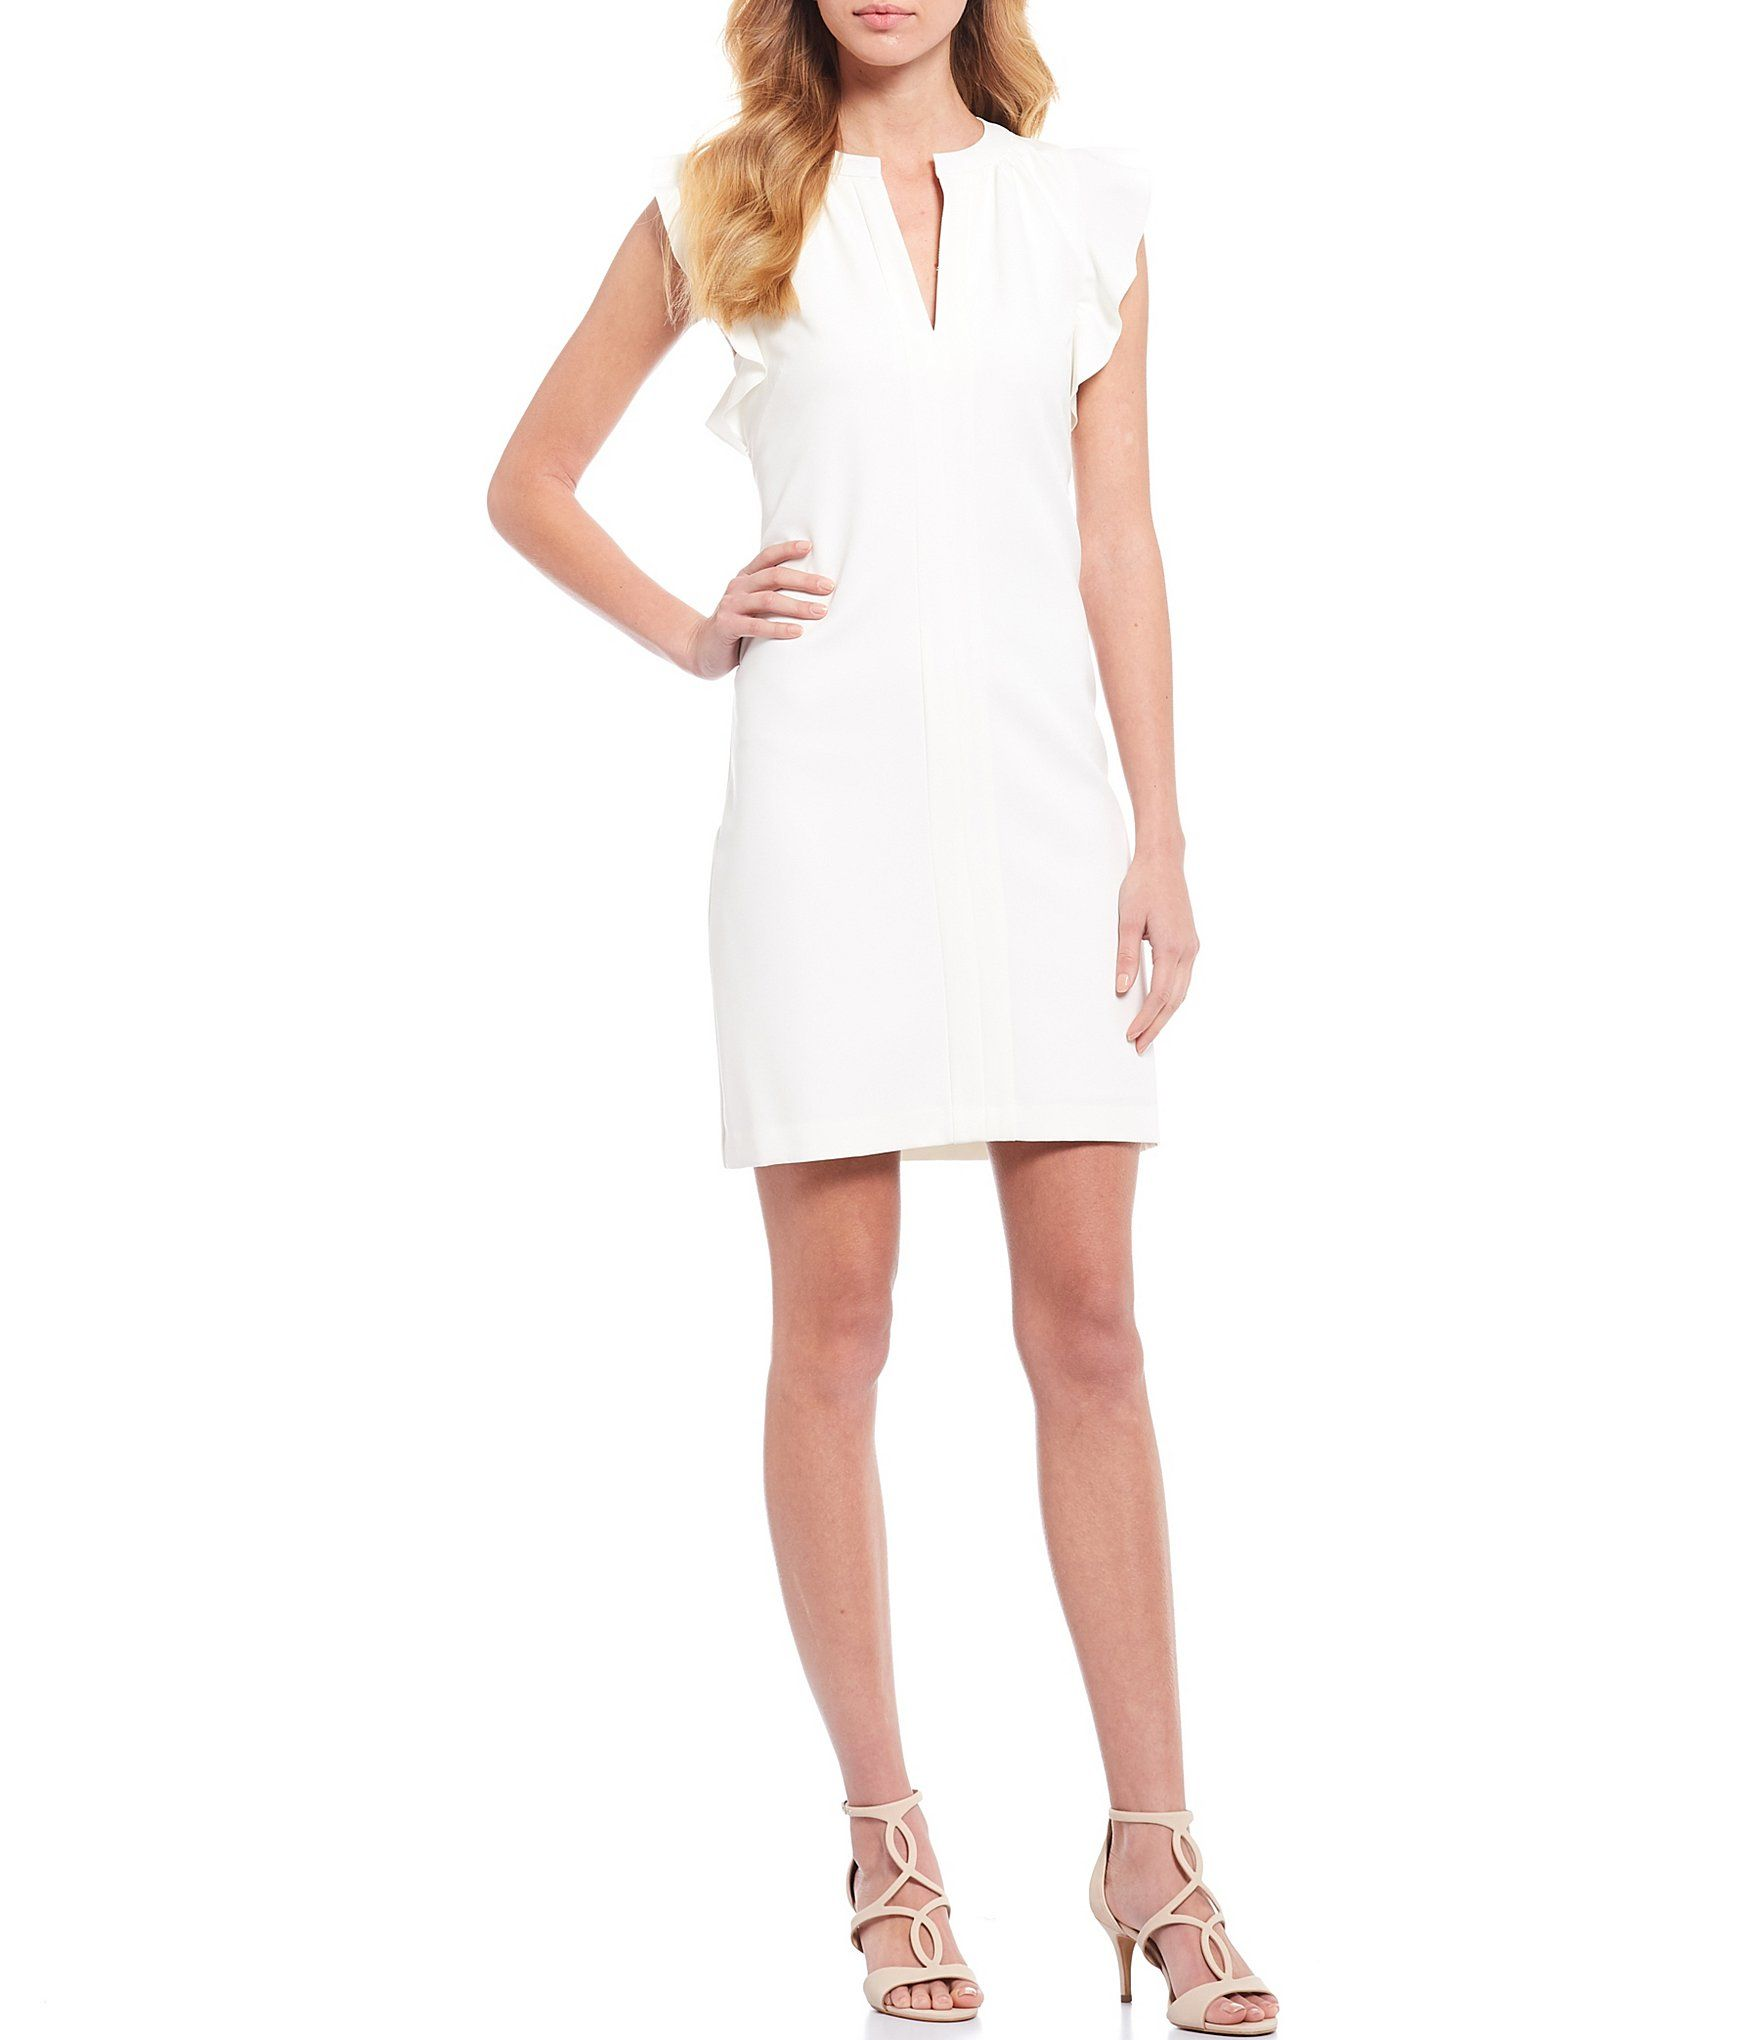 Vince Camuto Sleeveless Ruffle Crepe Dress 6 In 2021 Dresses Crepe Dress Sheath Dress [ 2040 x 1760 Pixel ]